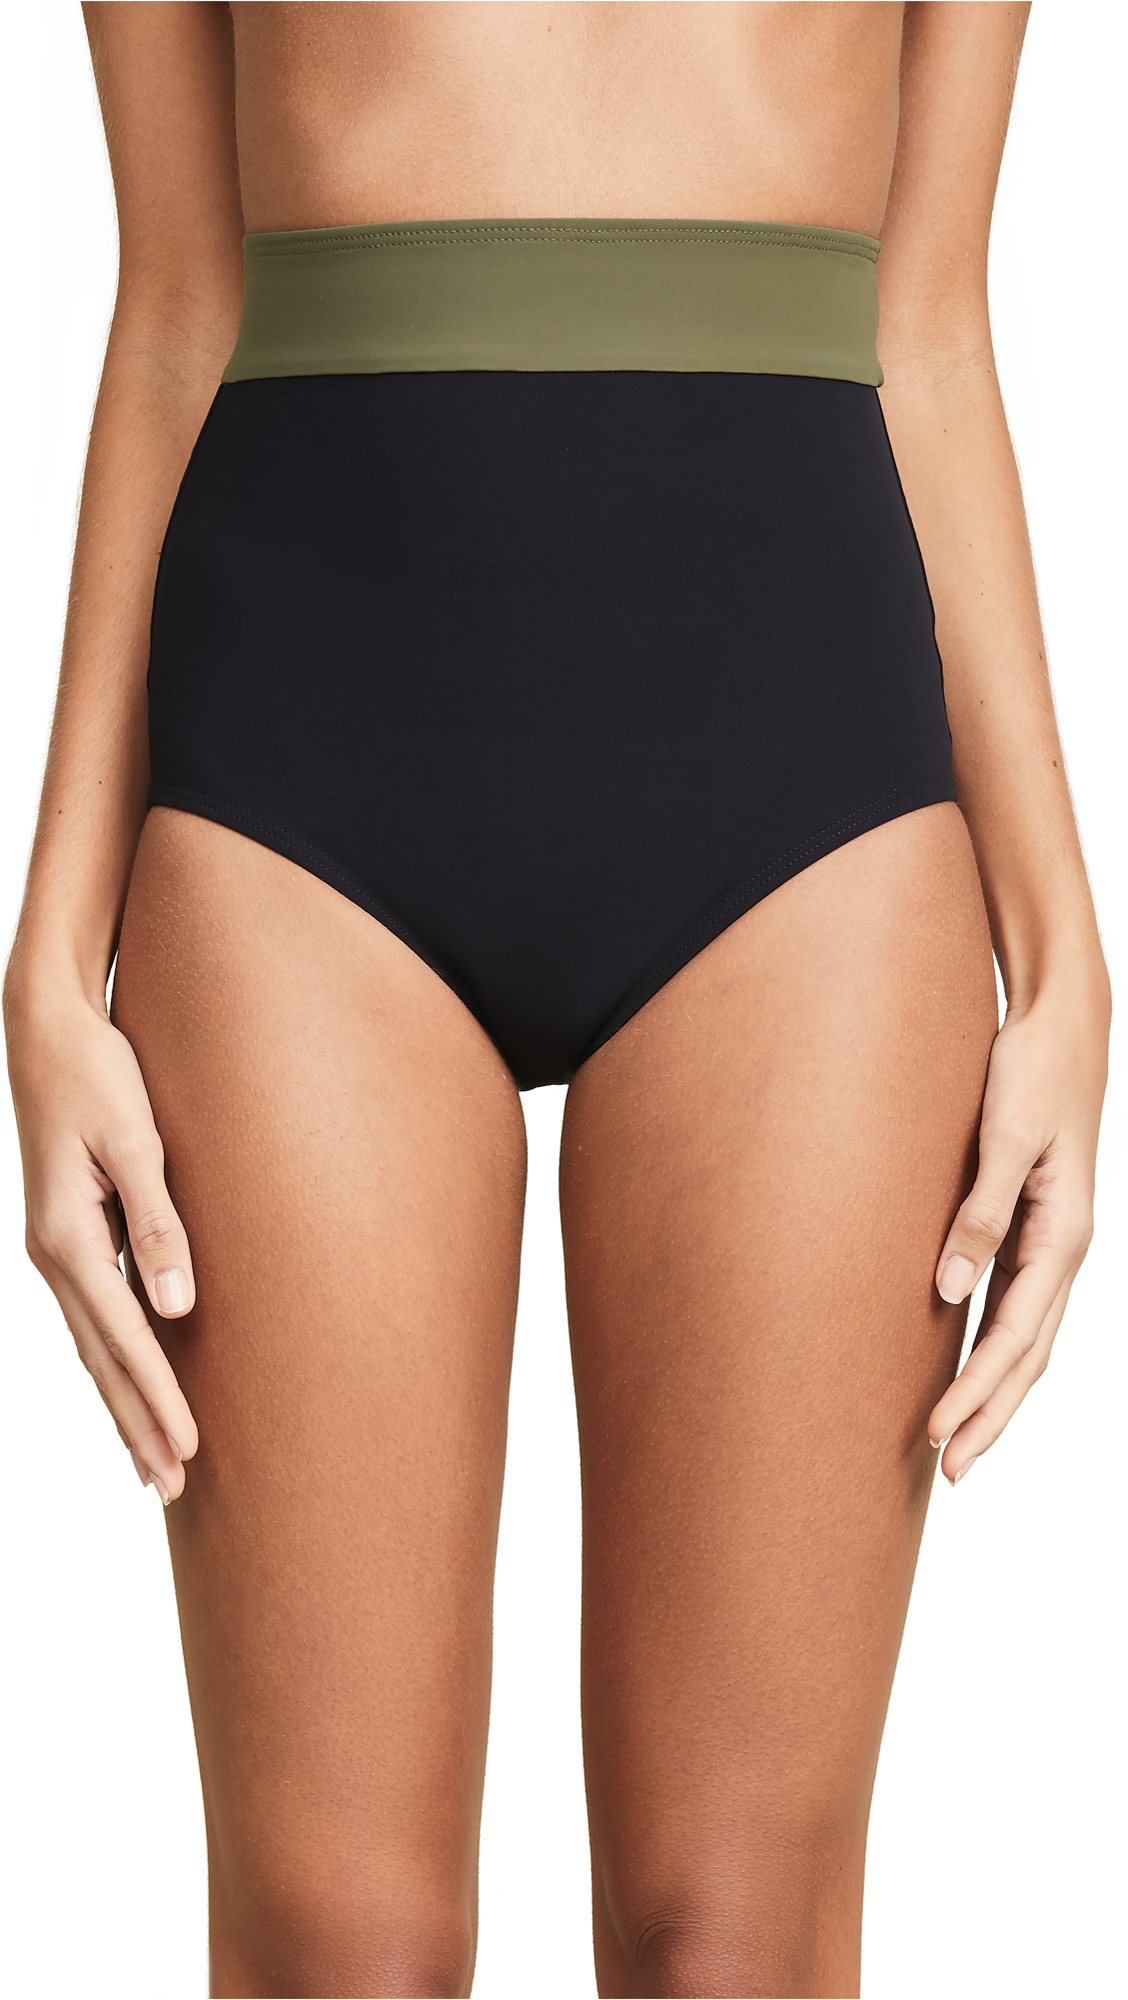 FLAGPOLE Arden High Rise Bikini Bottoms in Black/Olive